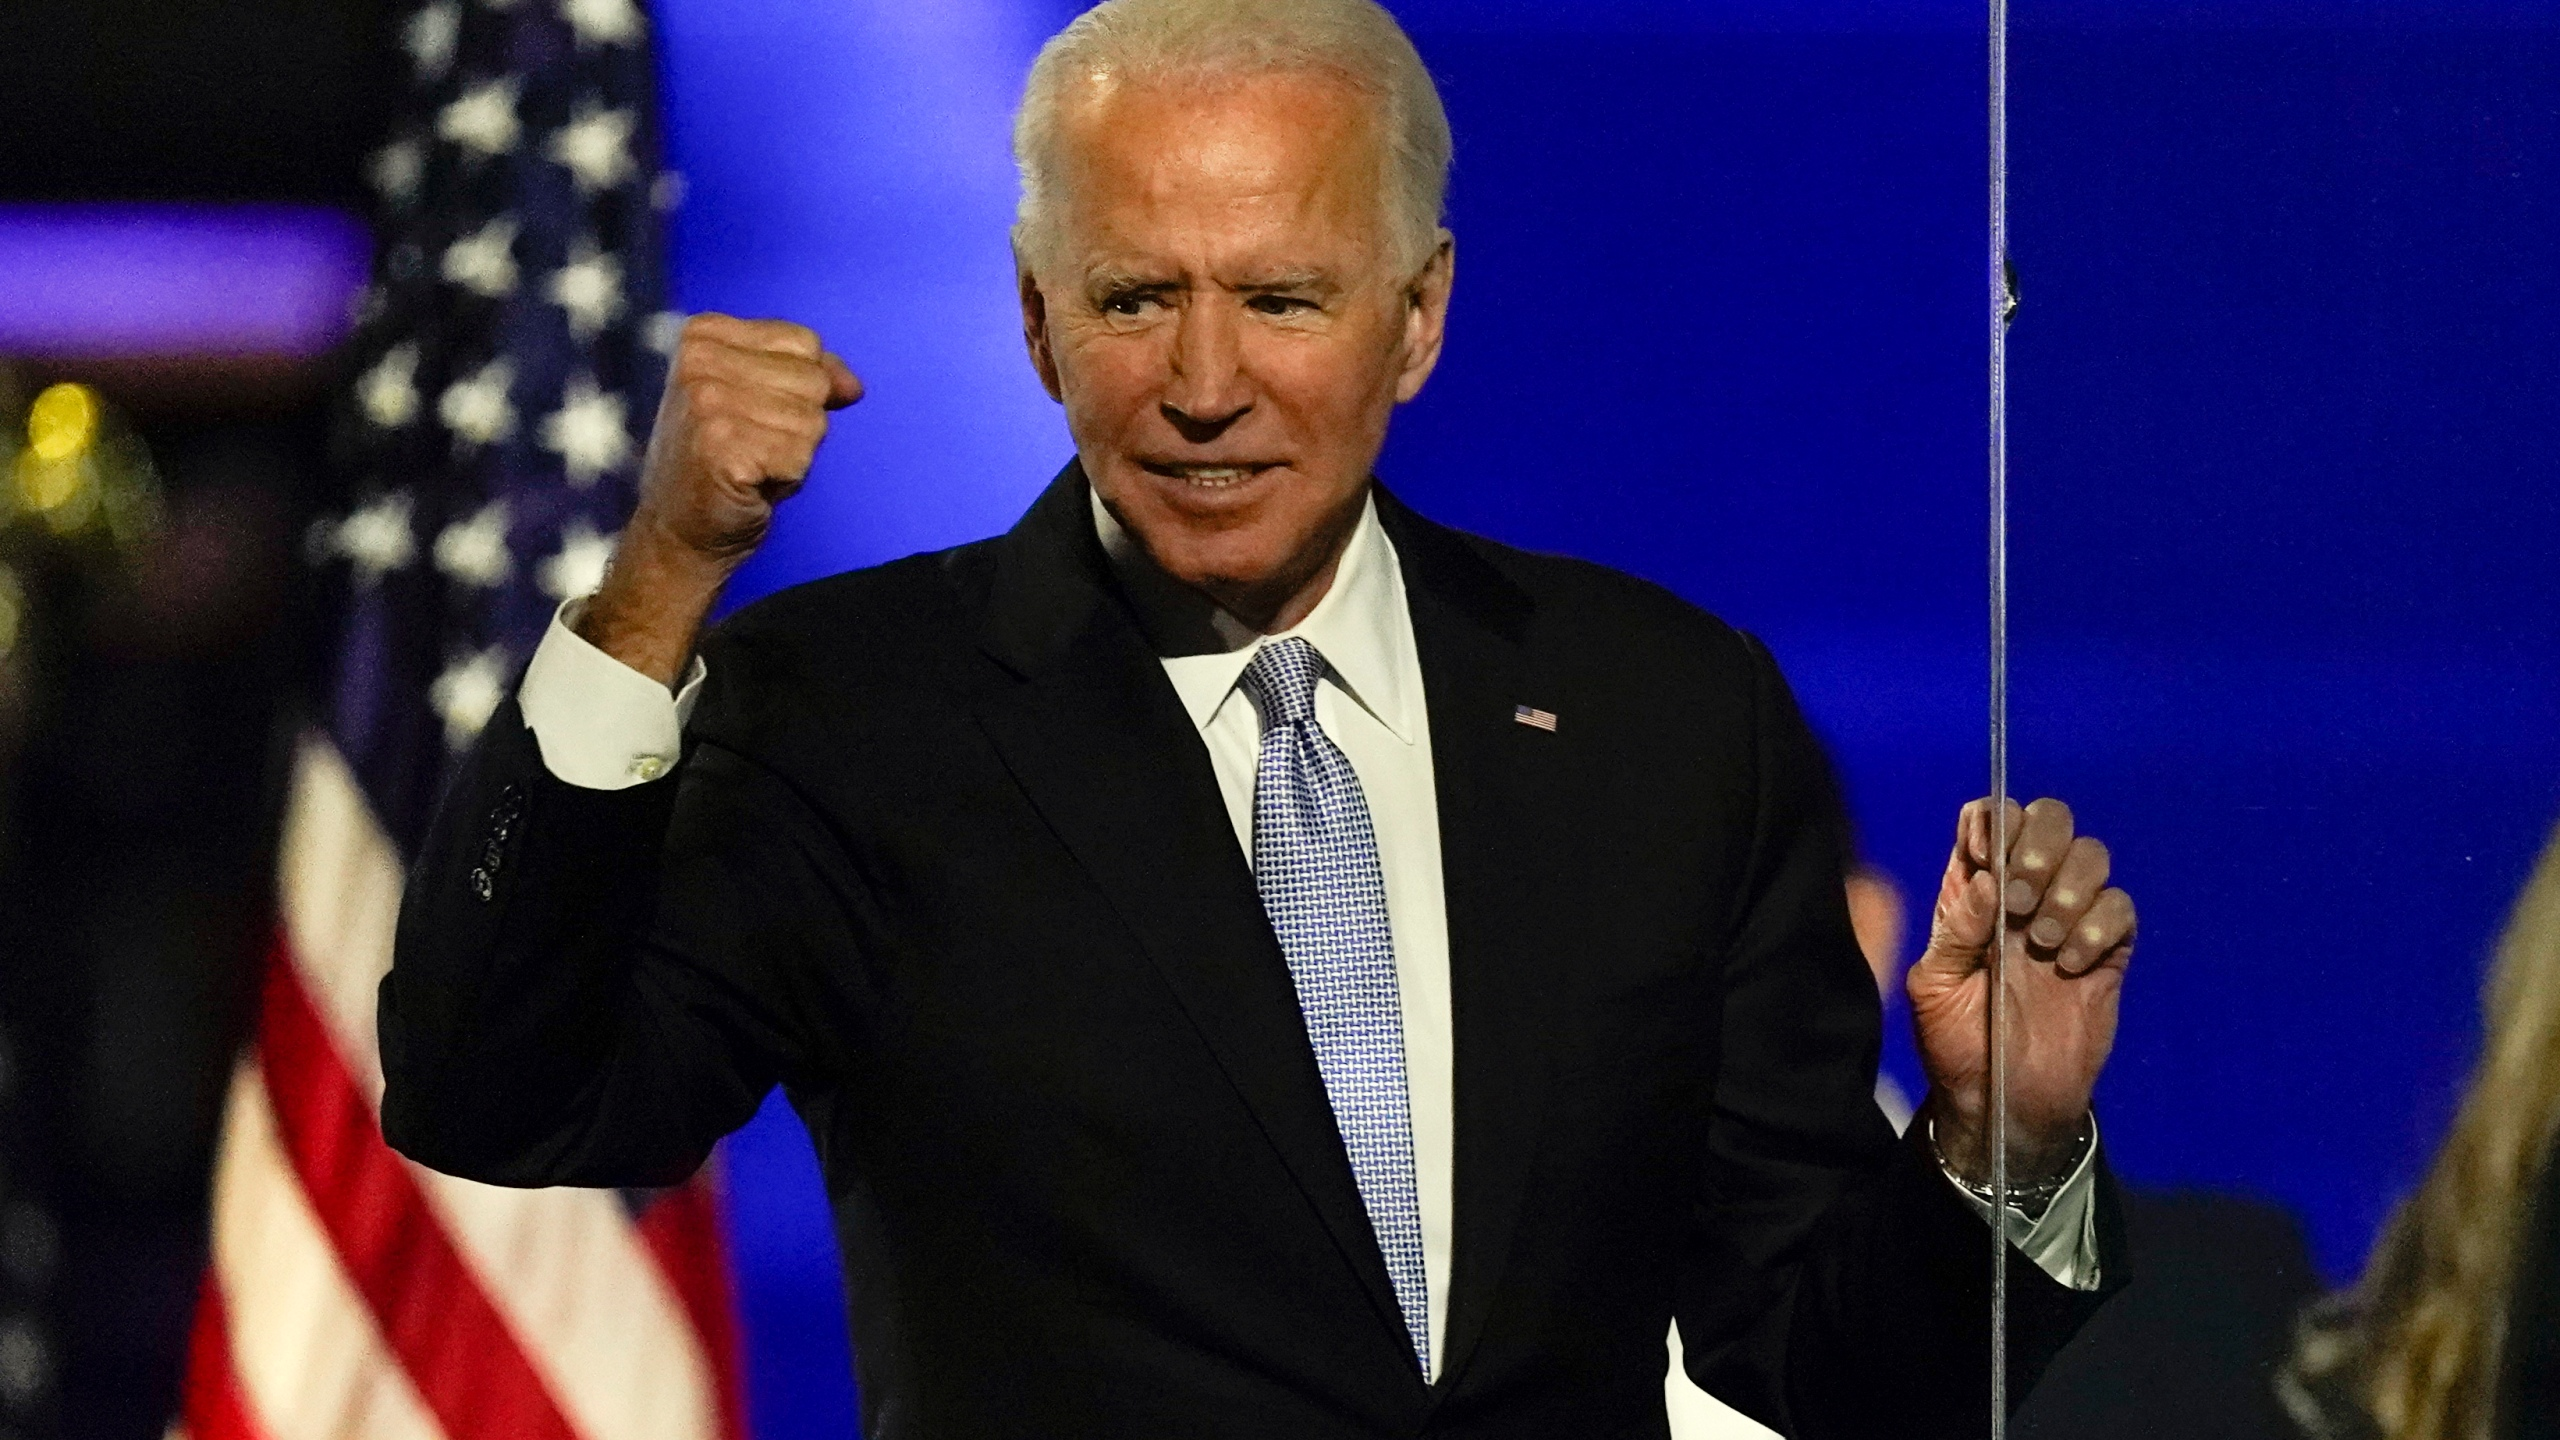 President-elect Joe Biden gestures to supporters Saturday, Nov. 7, 2020, in Wilmington, Del. (Andrew Harnik/AP Photo)